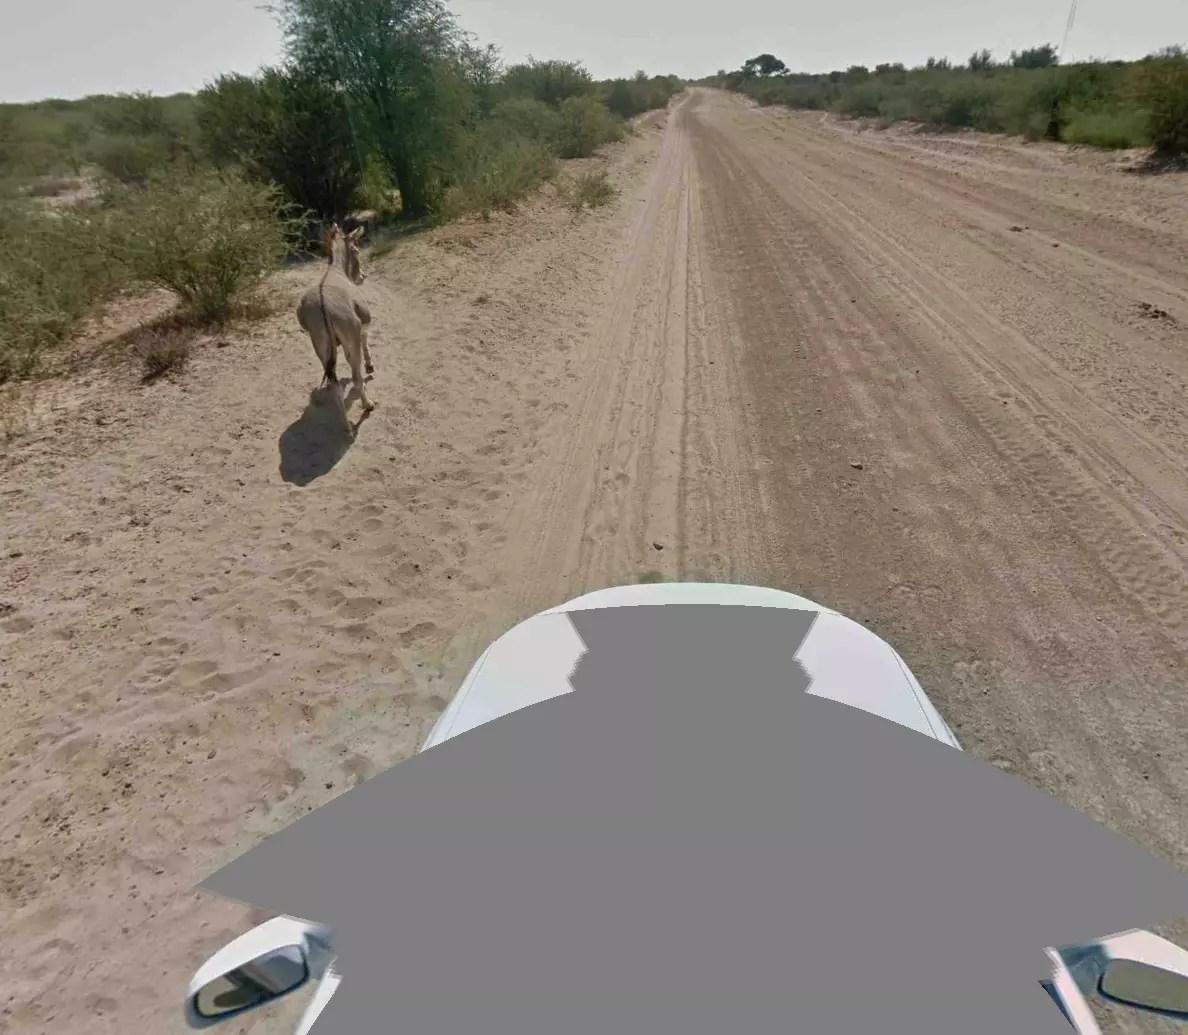 burro atropellado google street view 3